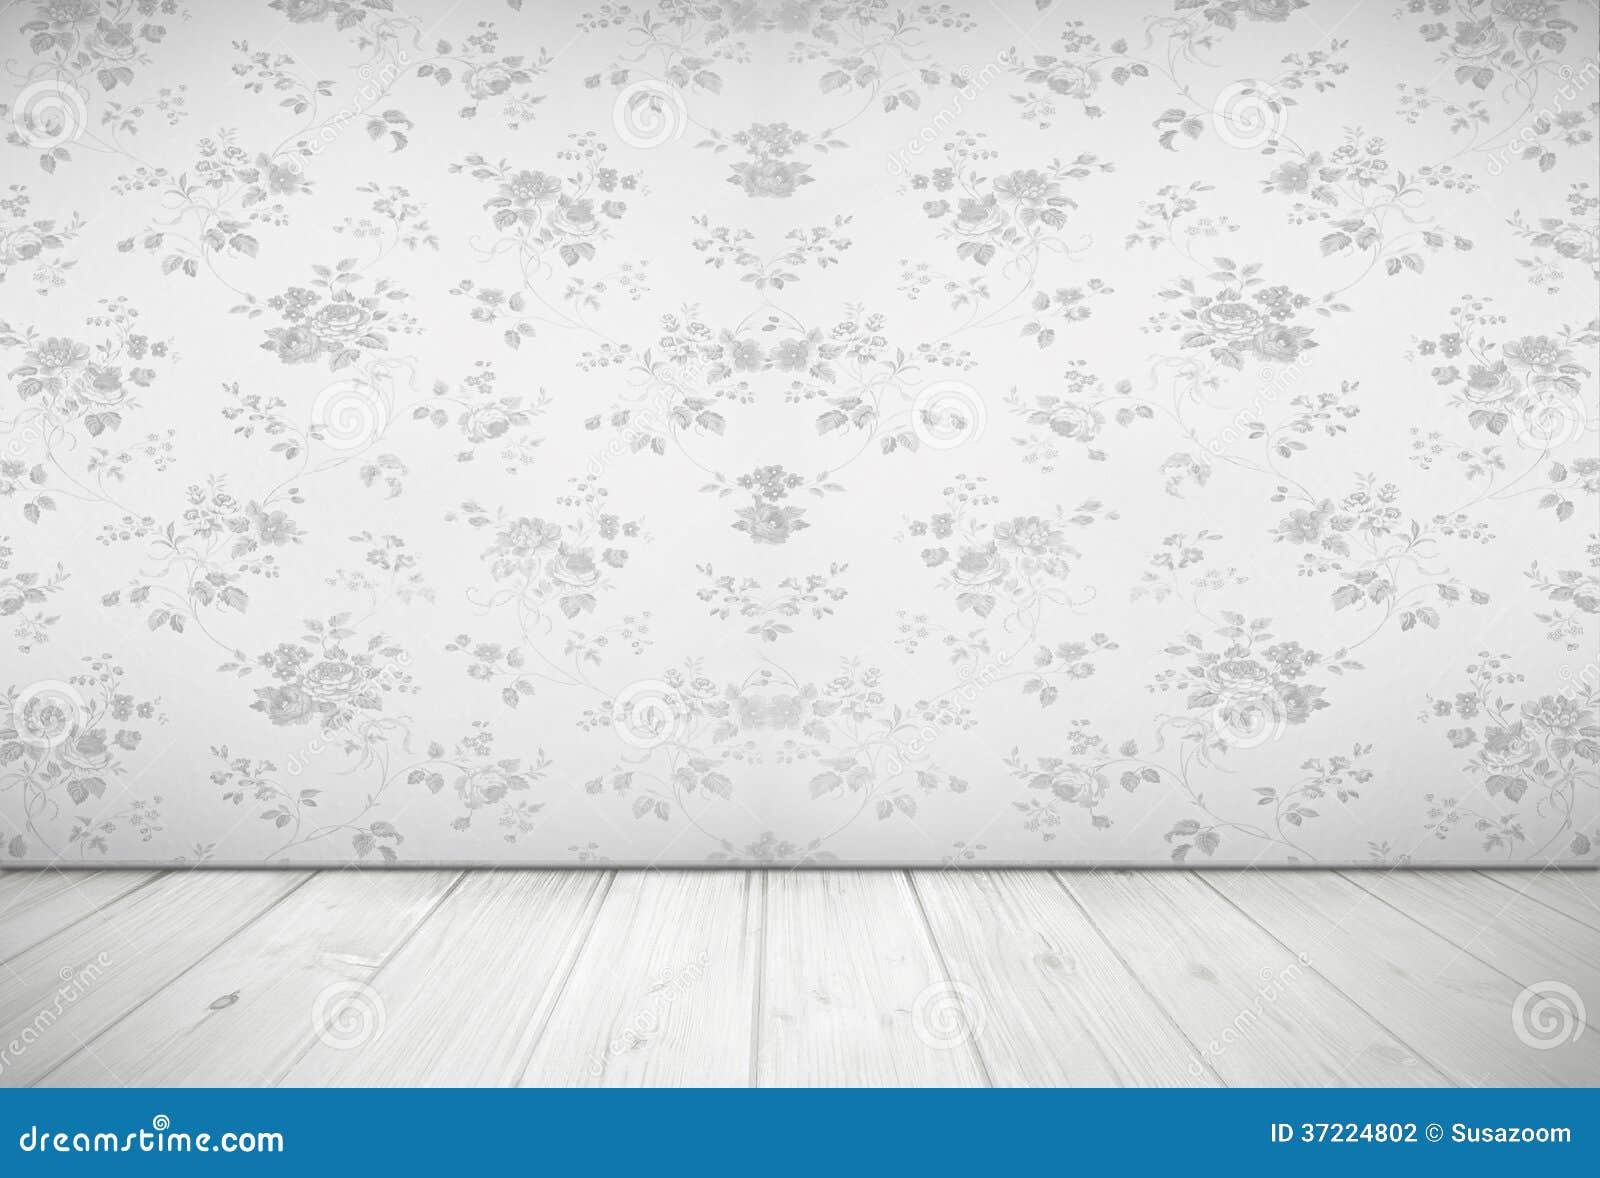 ESTAhomenl  make yourself at home! wallpaper wall